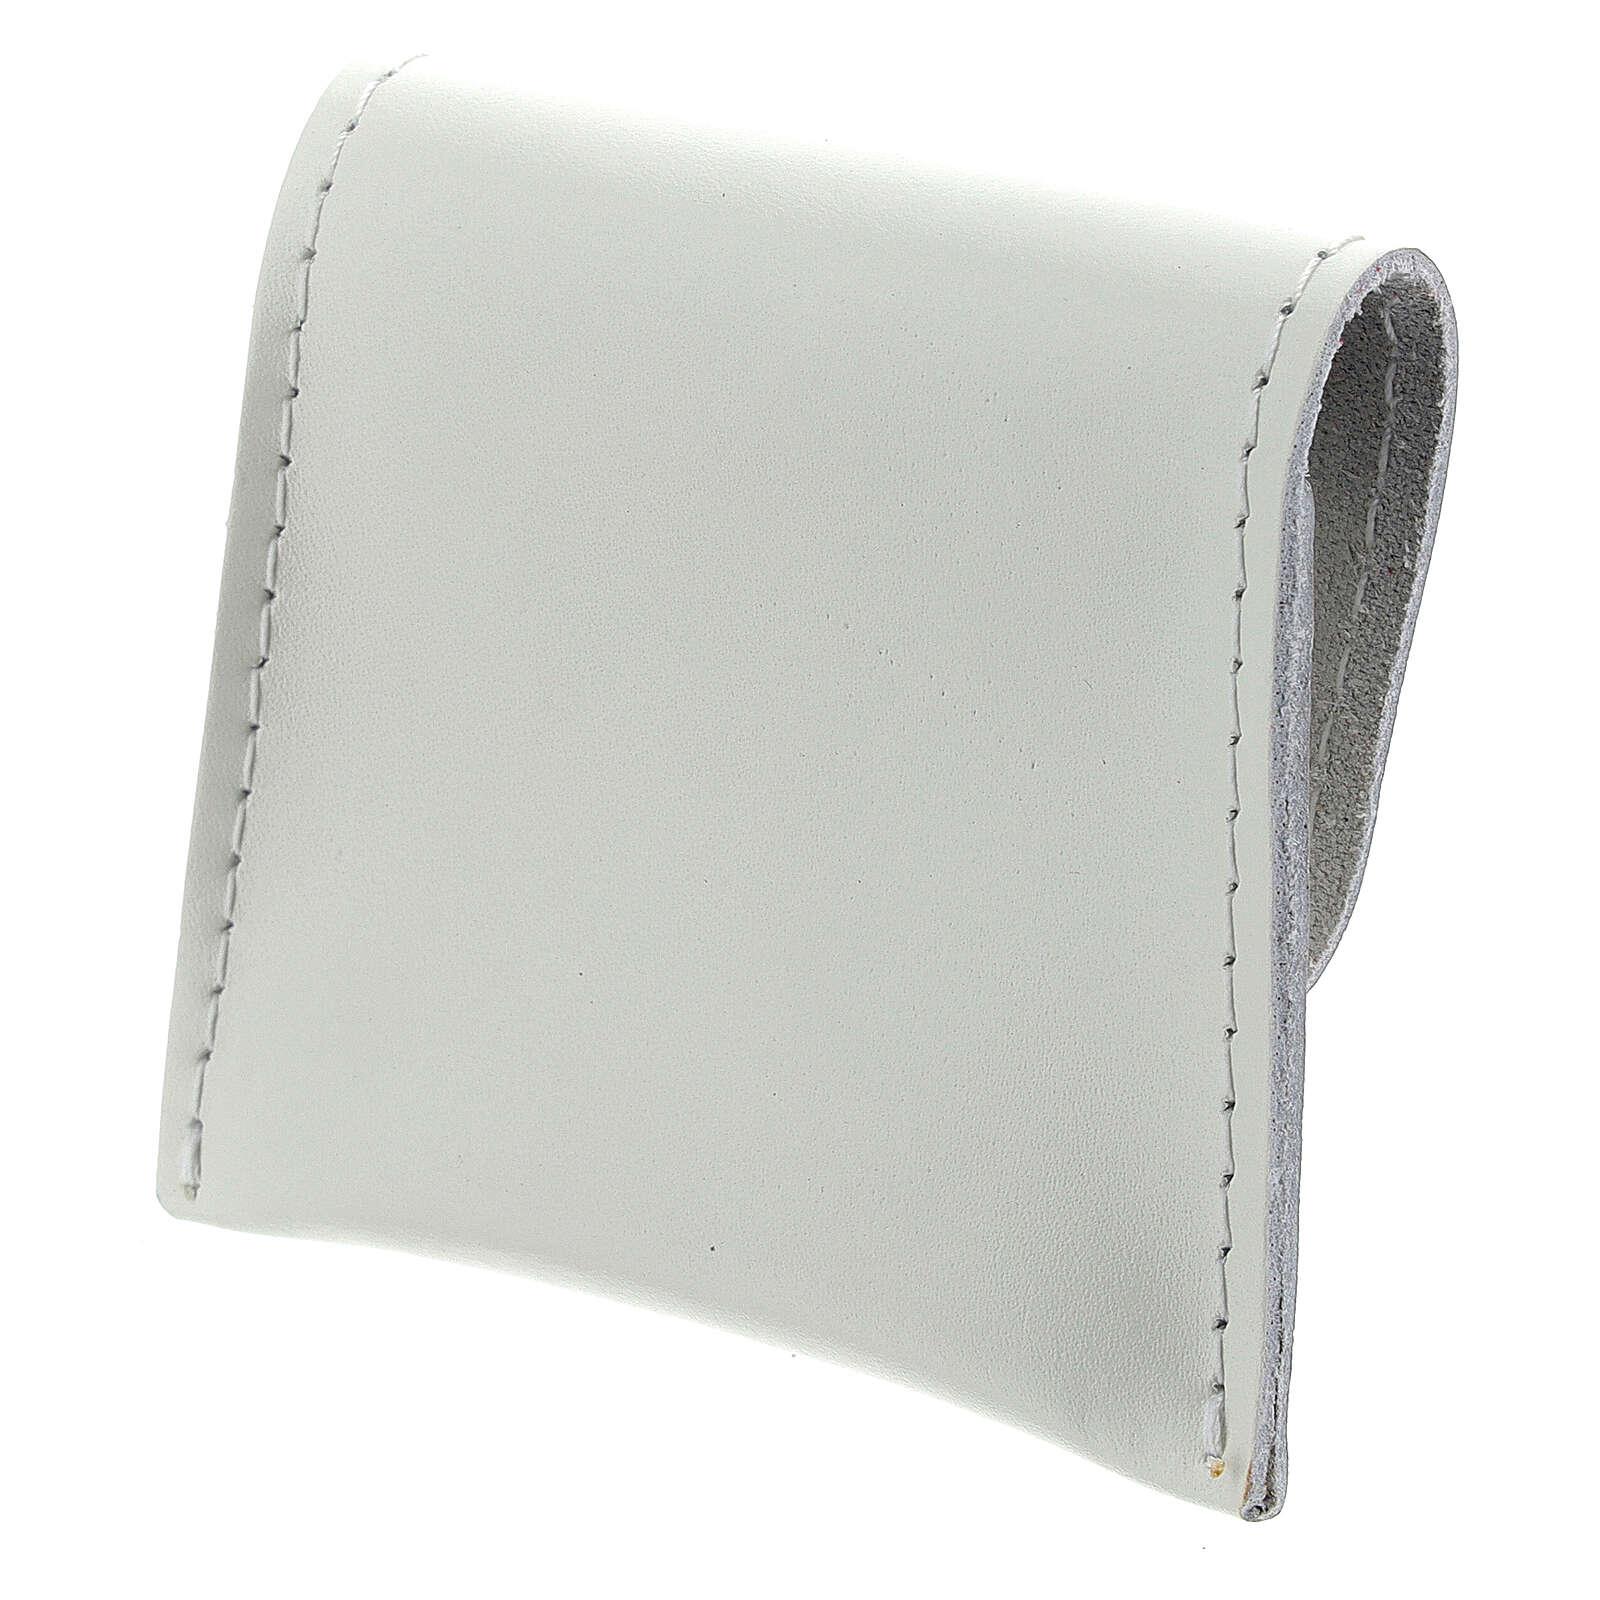 Pochette chapelet cuir blanc bouton 7x8 cm 4